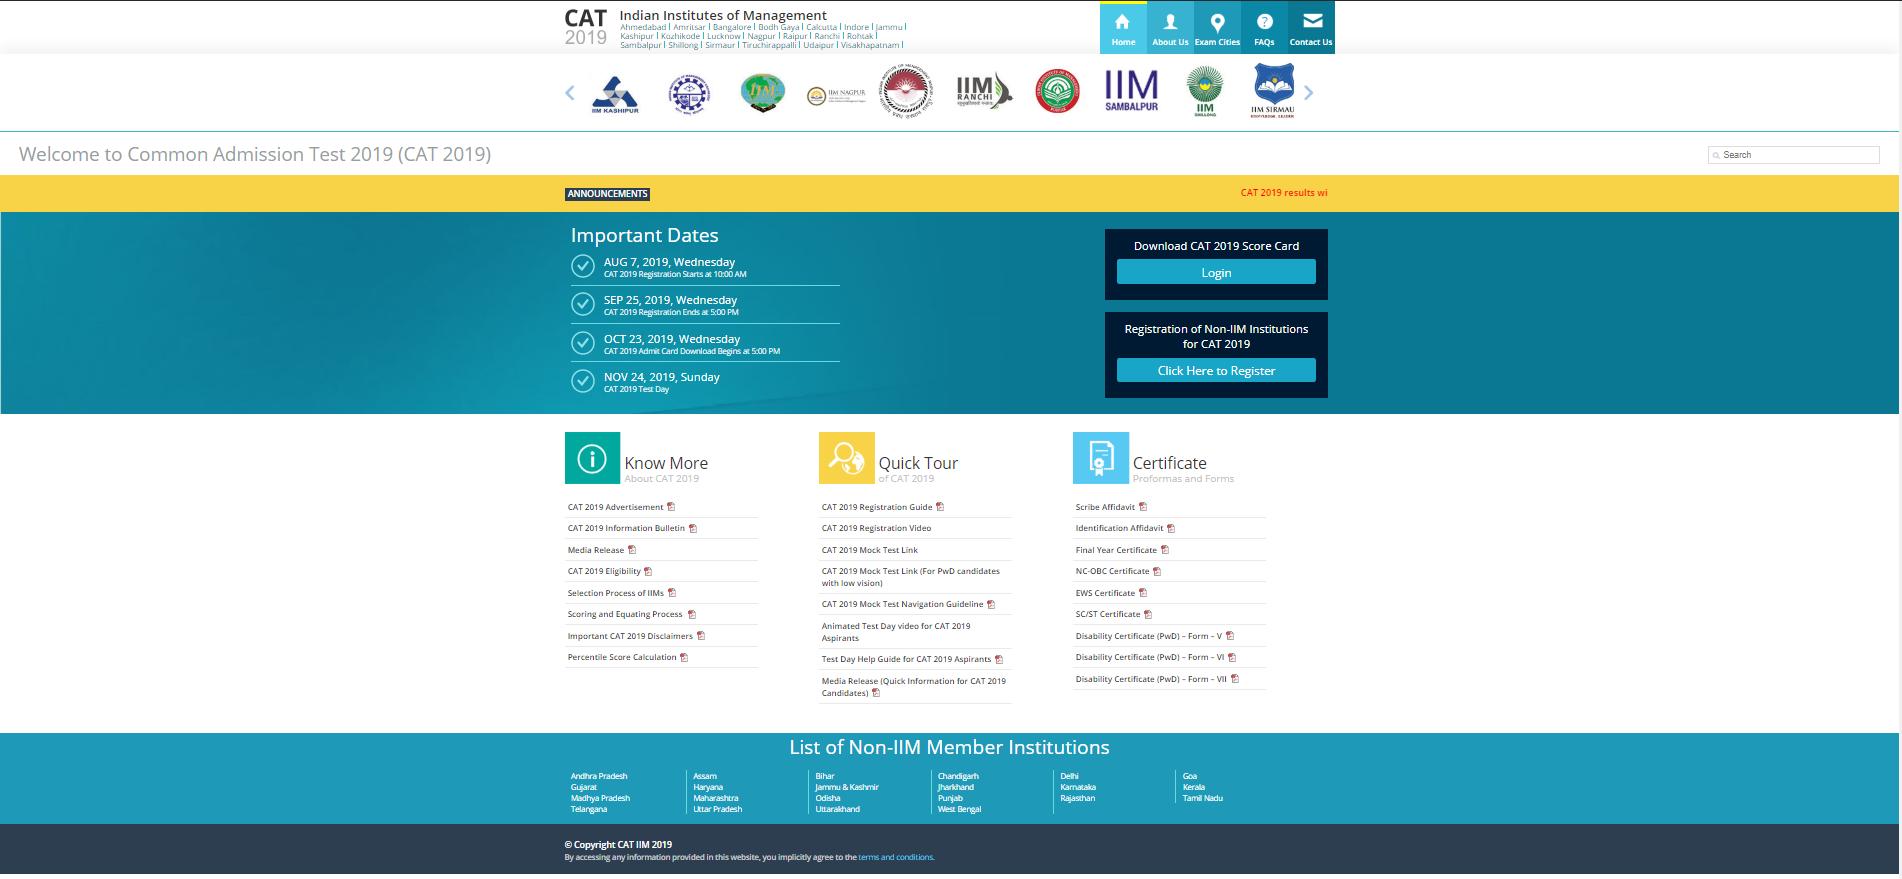 CAT 2019 Official Website